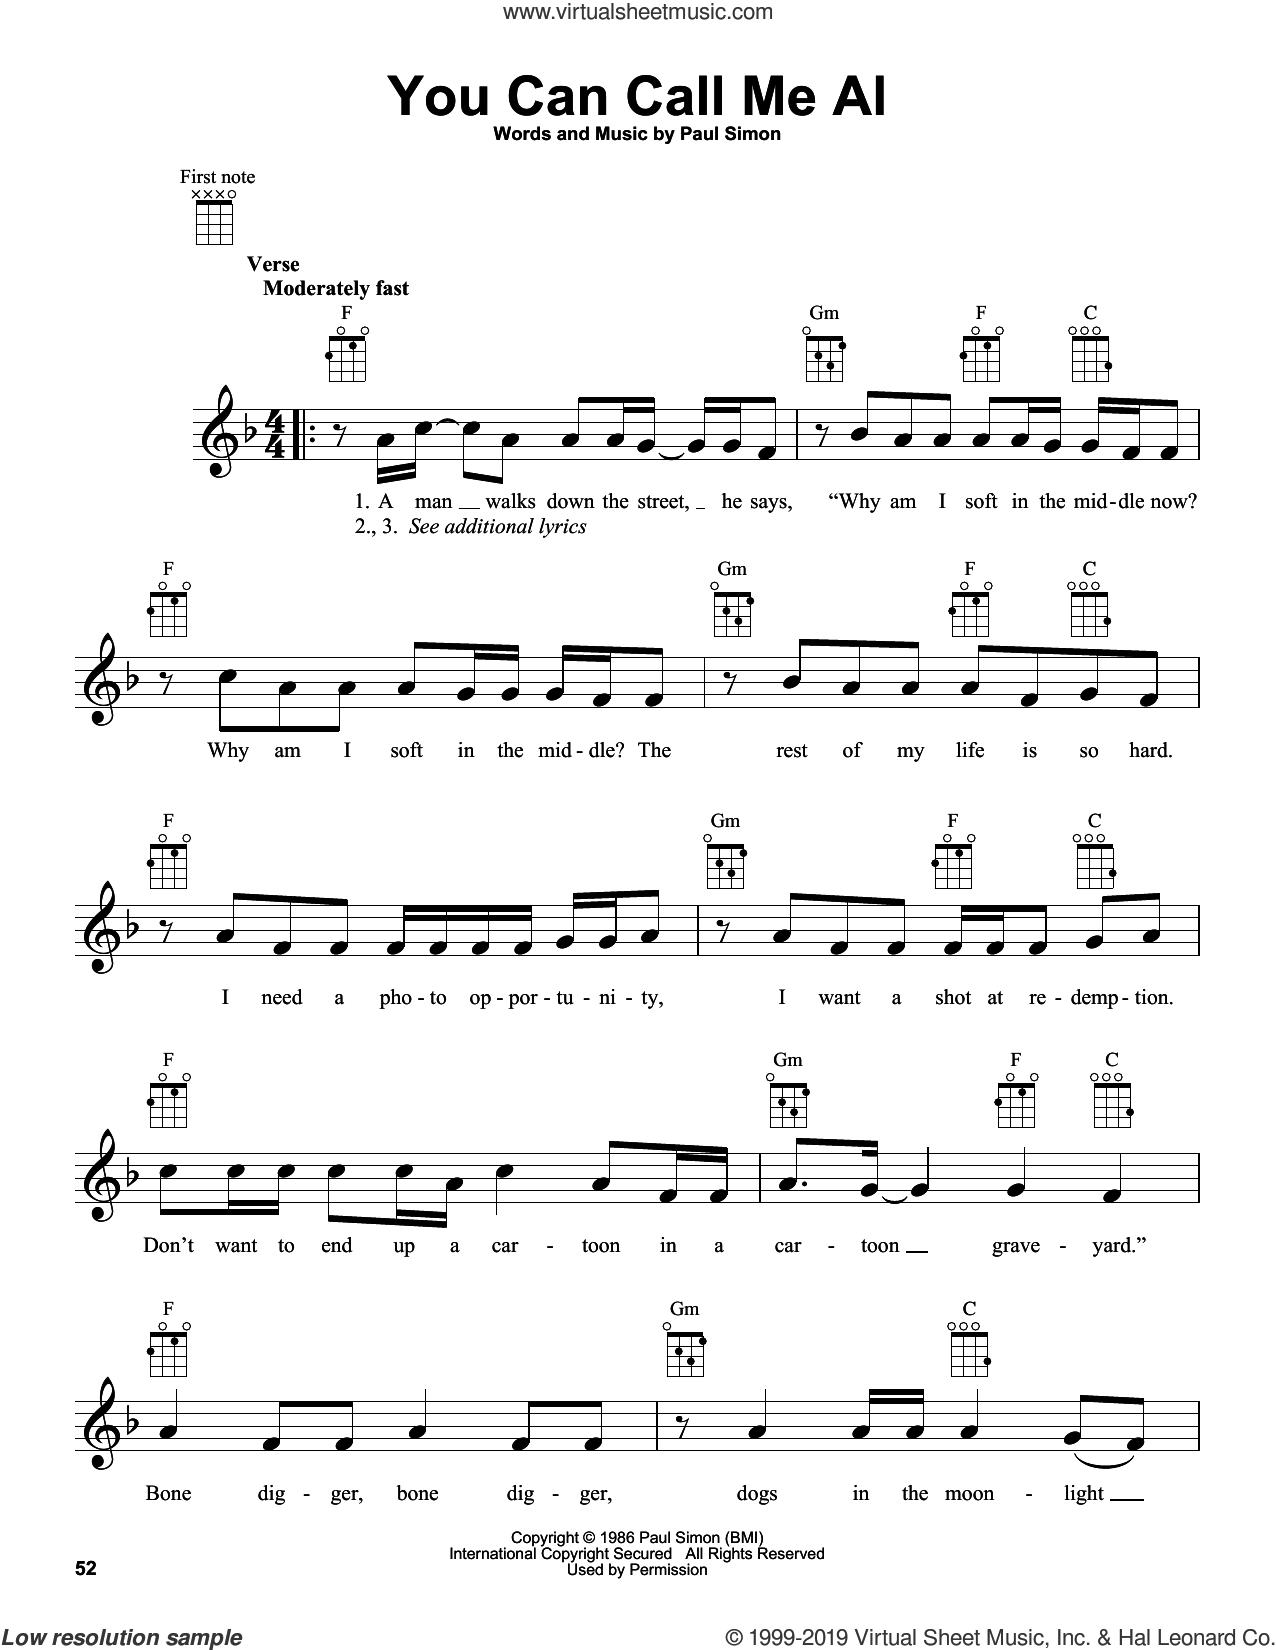 You Can Call Me Al sheet music for ukulele by Paul Simon and Simon & Garfunkel, intermediate skill level